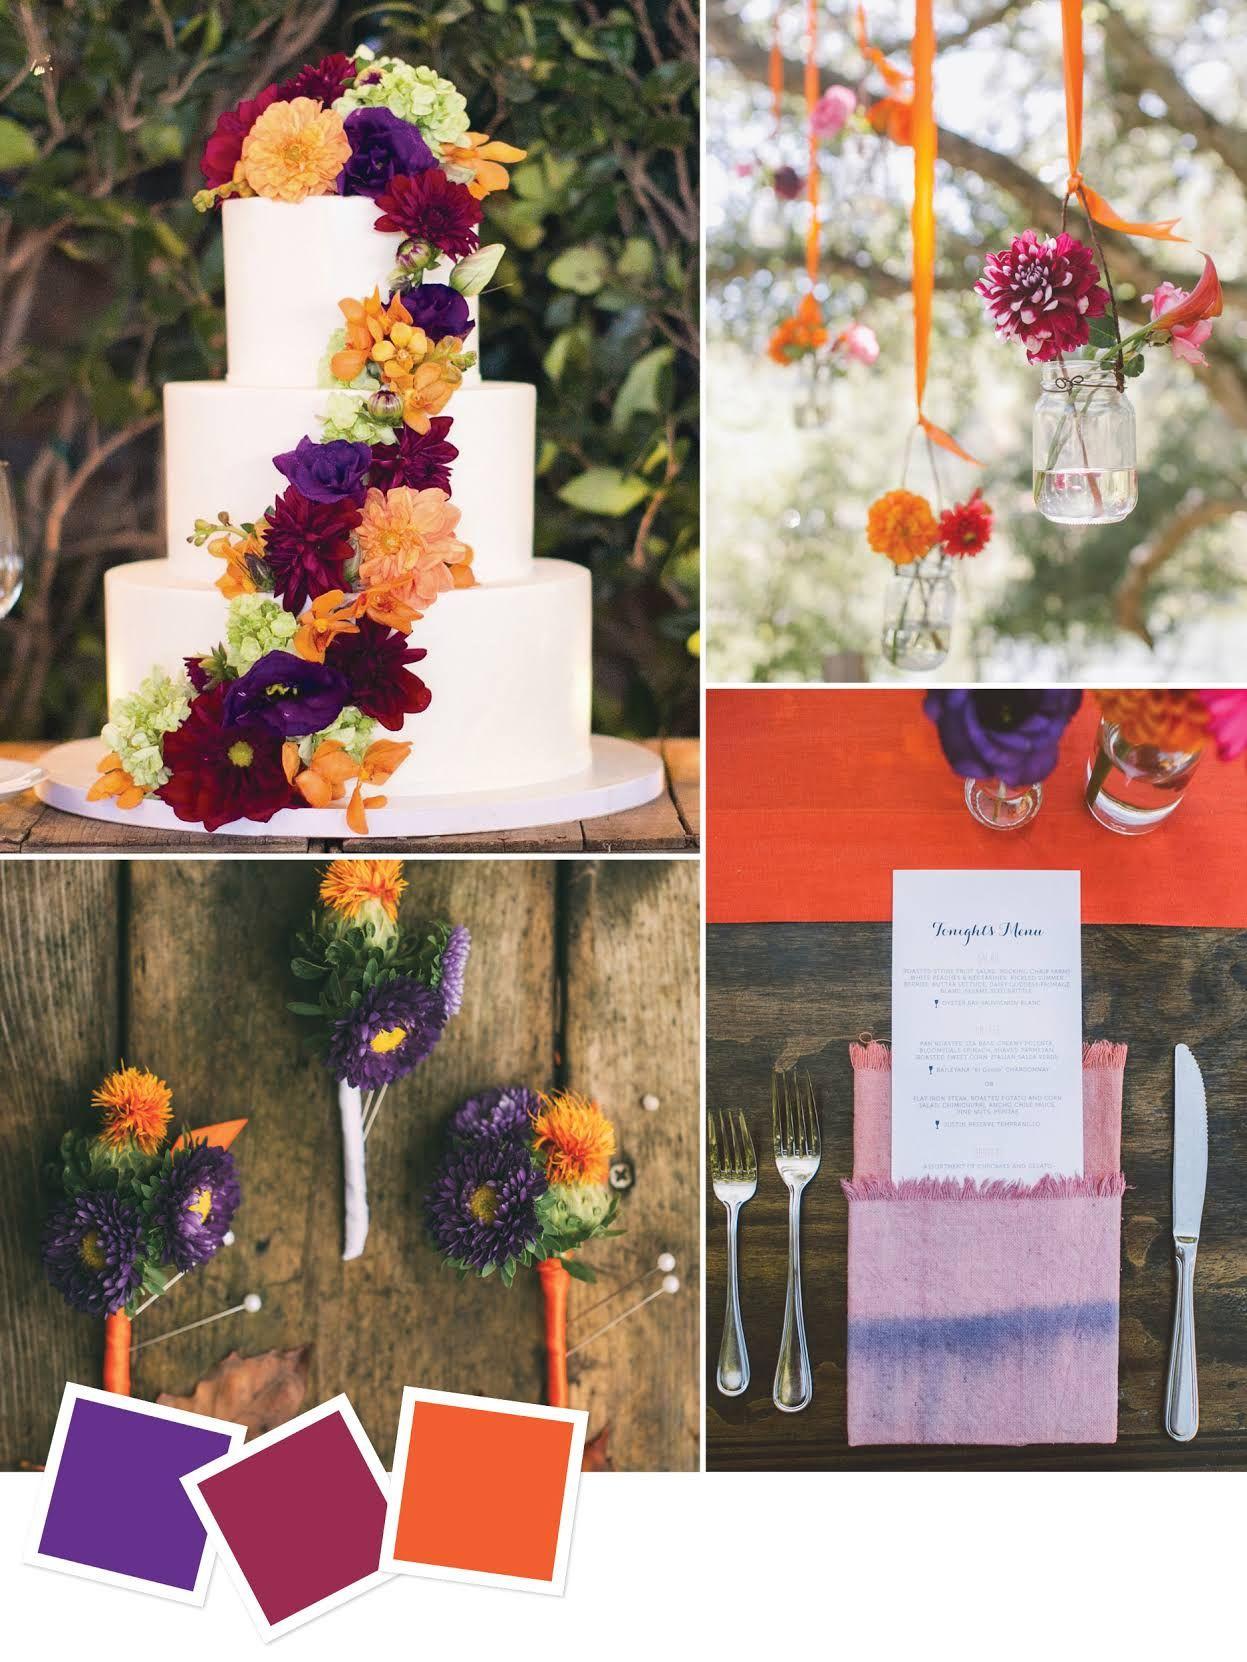 Purple Burgundy Orange Good For Vineyard Wedding Themes